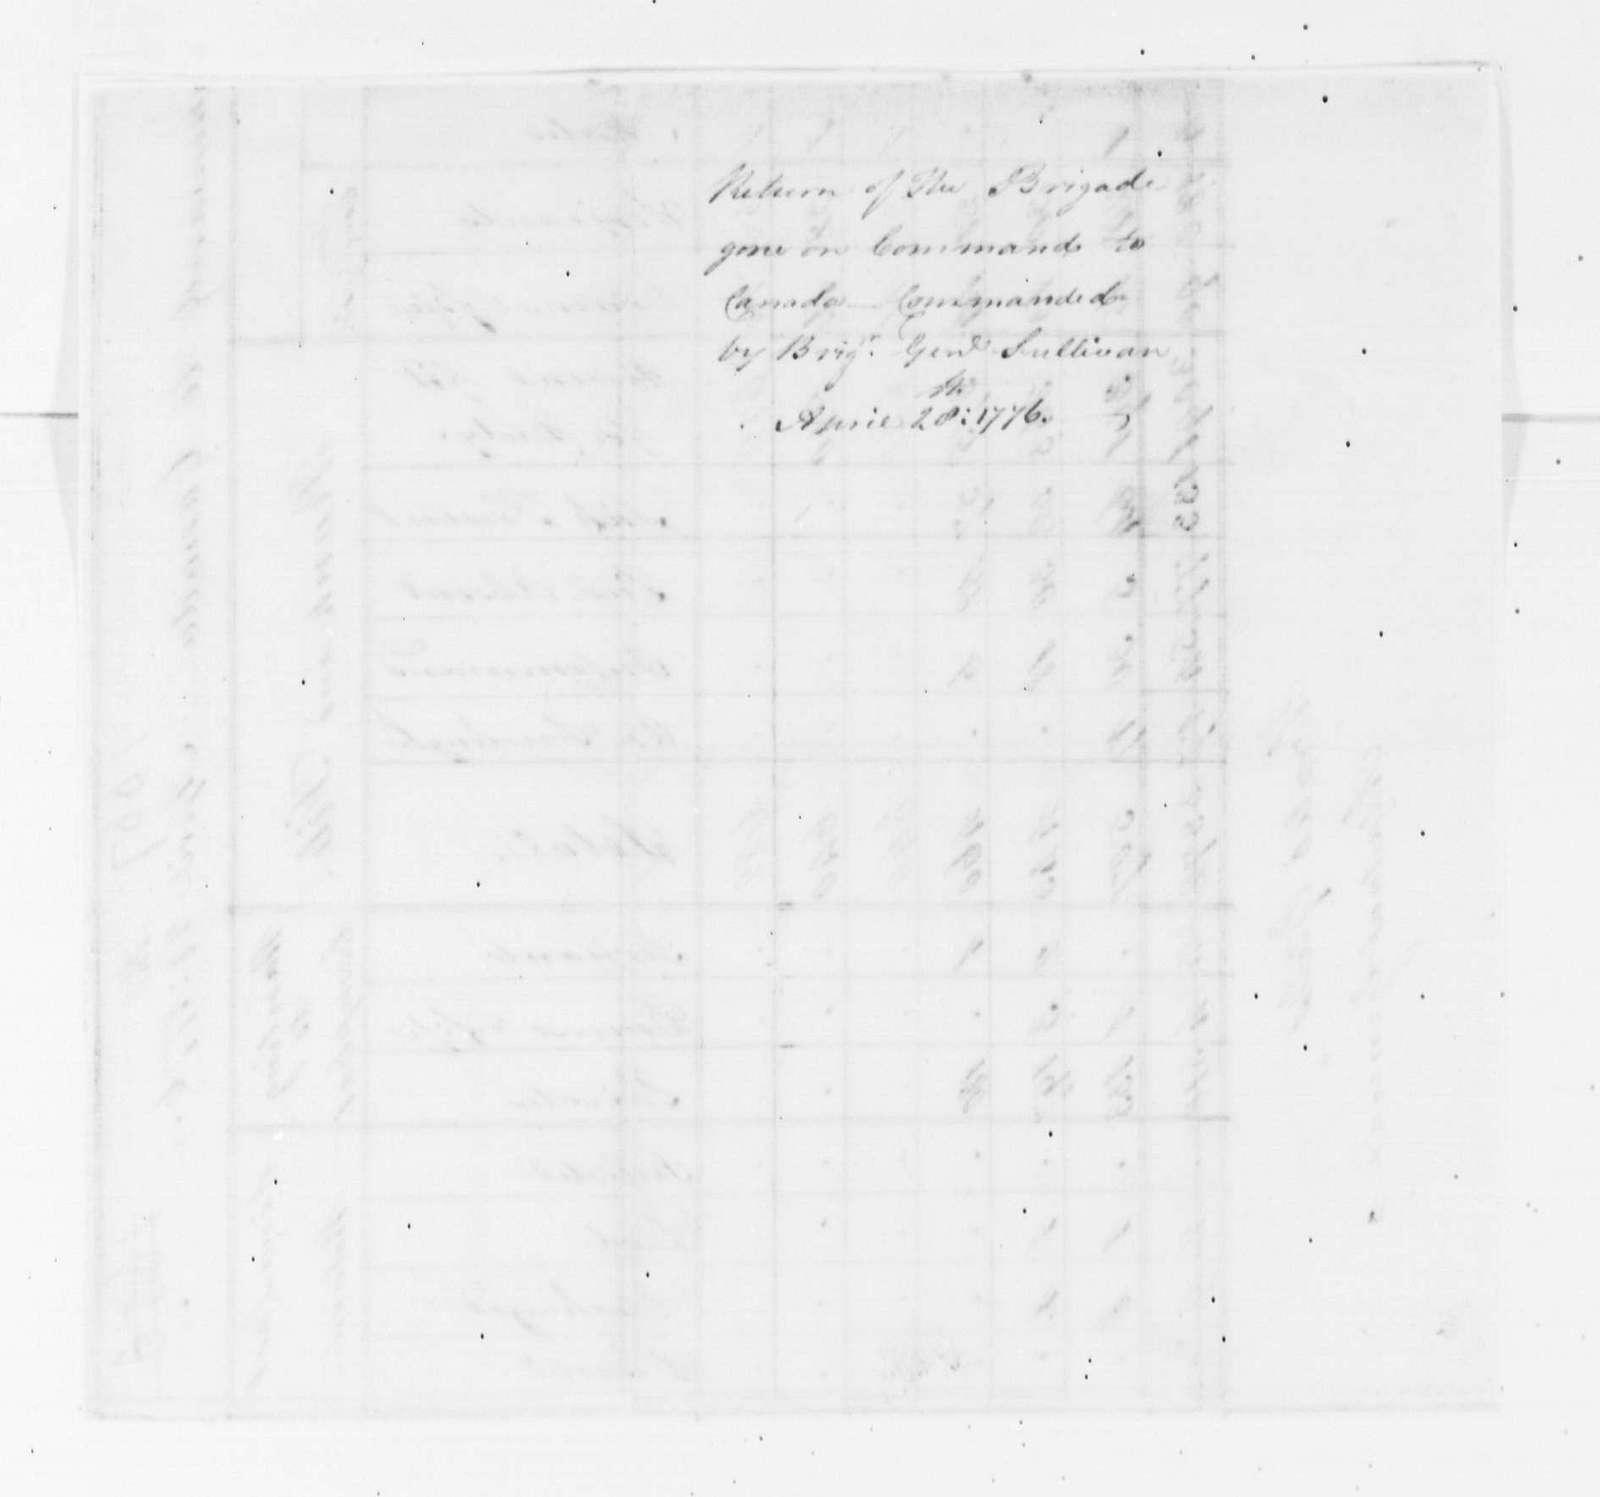 George Washington Papers, Series 4, General Correspondence: Horatio Gates, April 28, 1776, Report on Brigade Going to Canada under John Sullivan